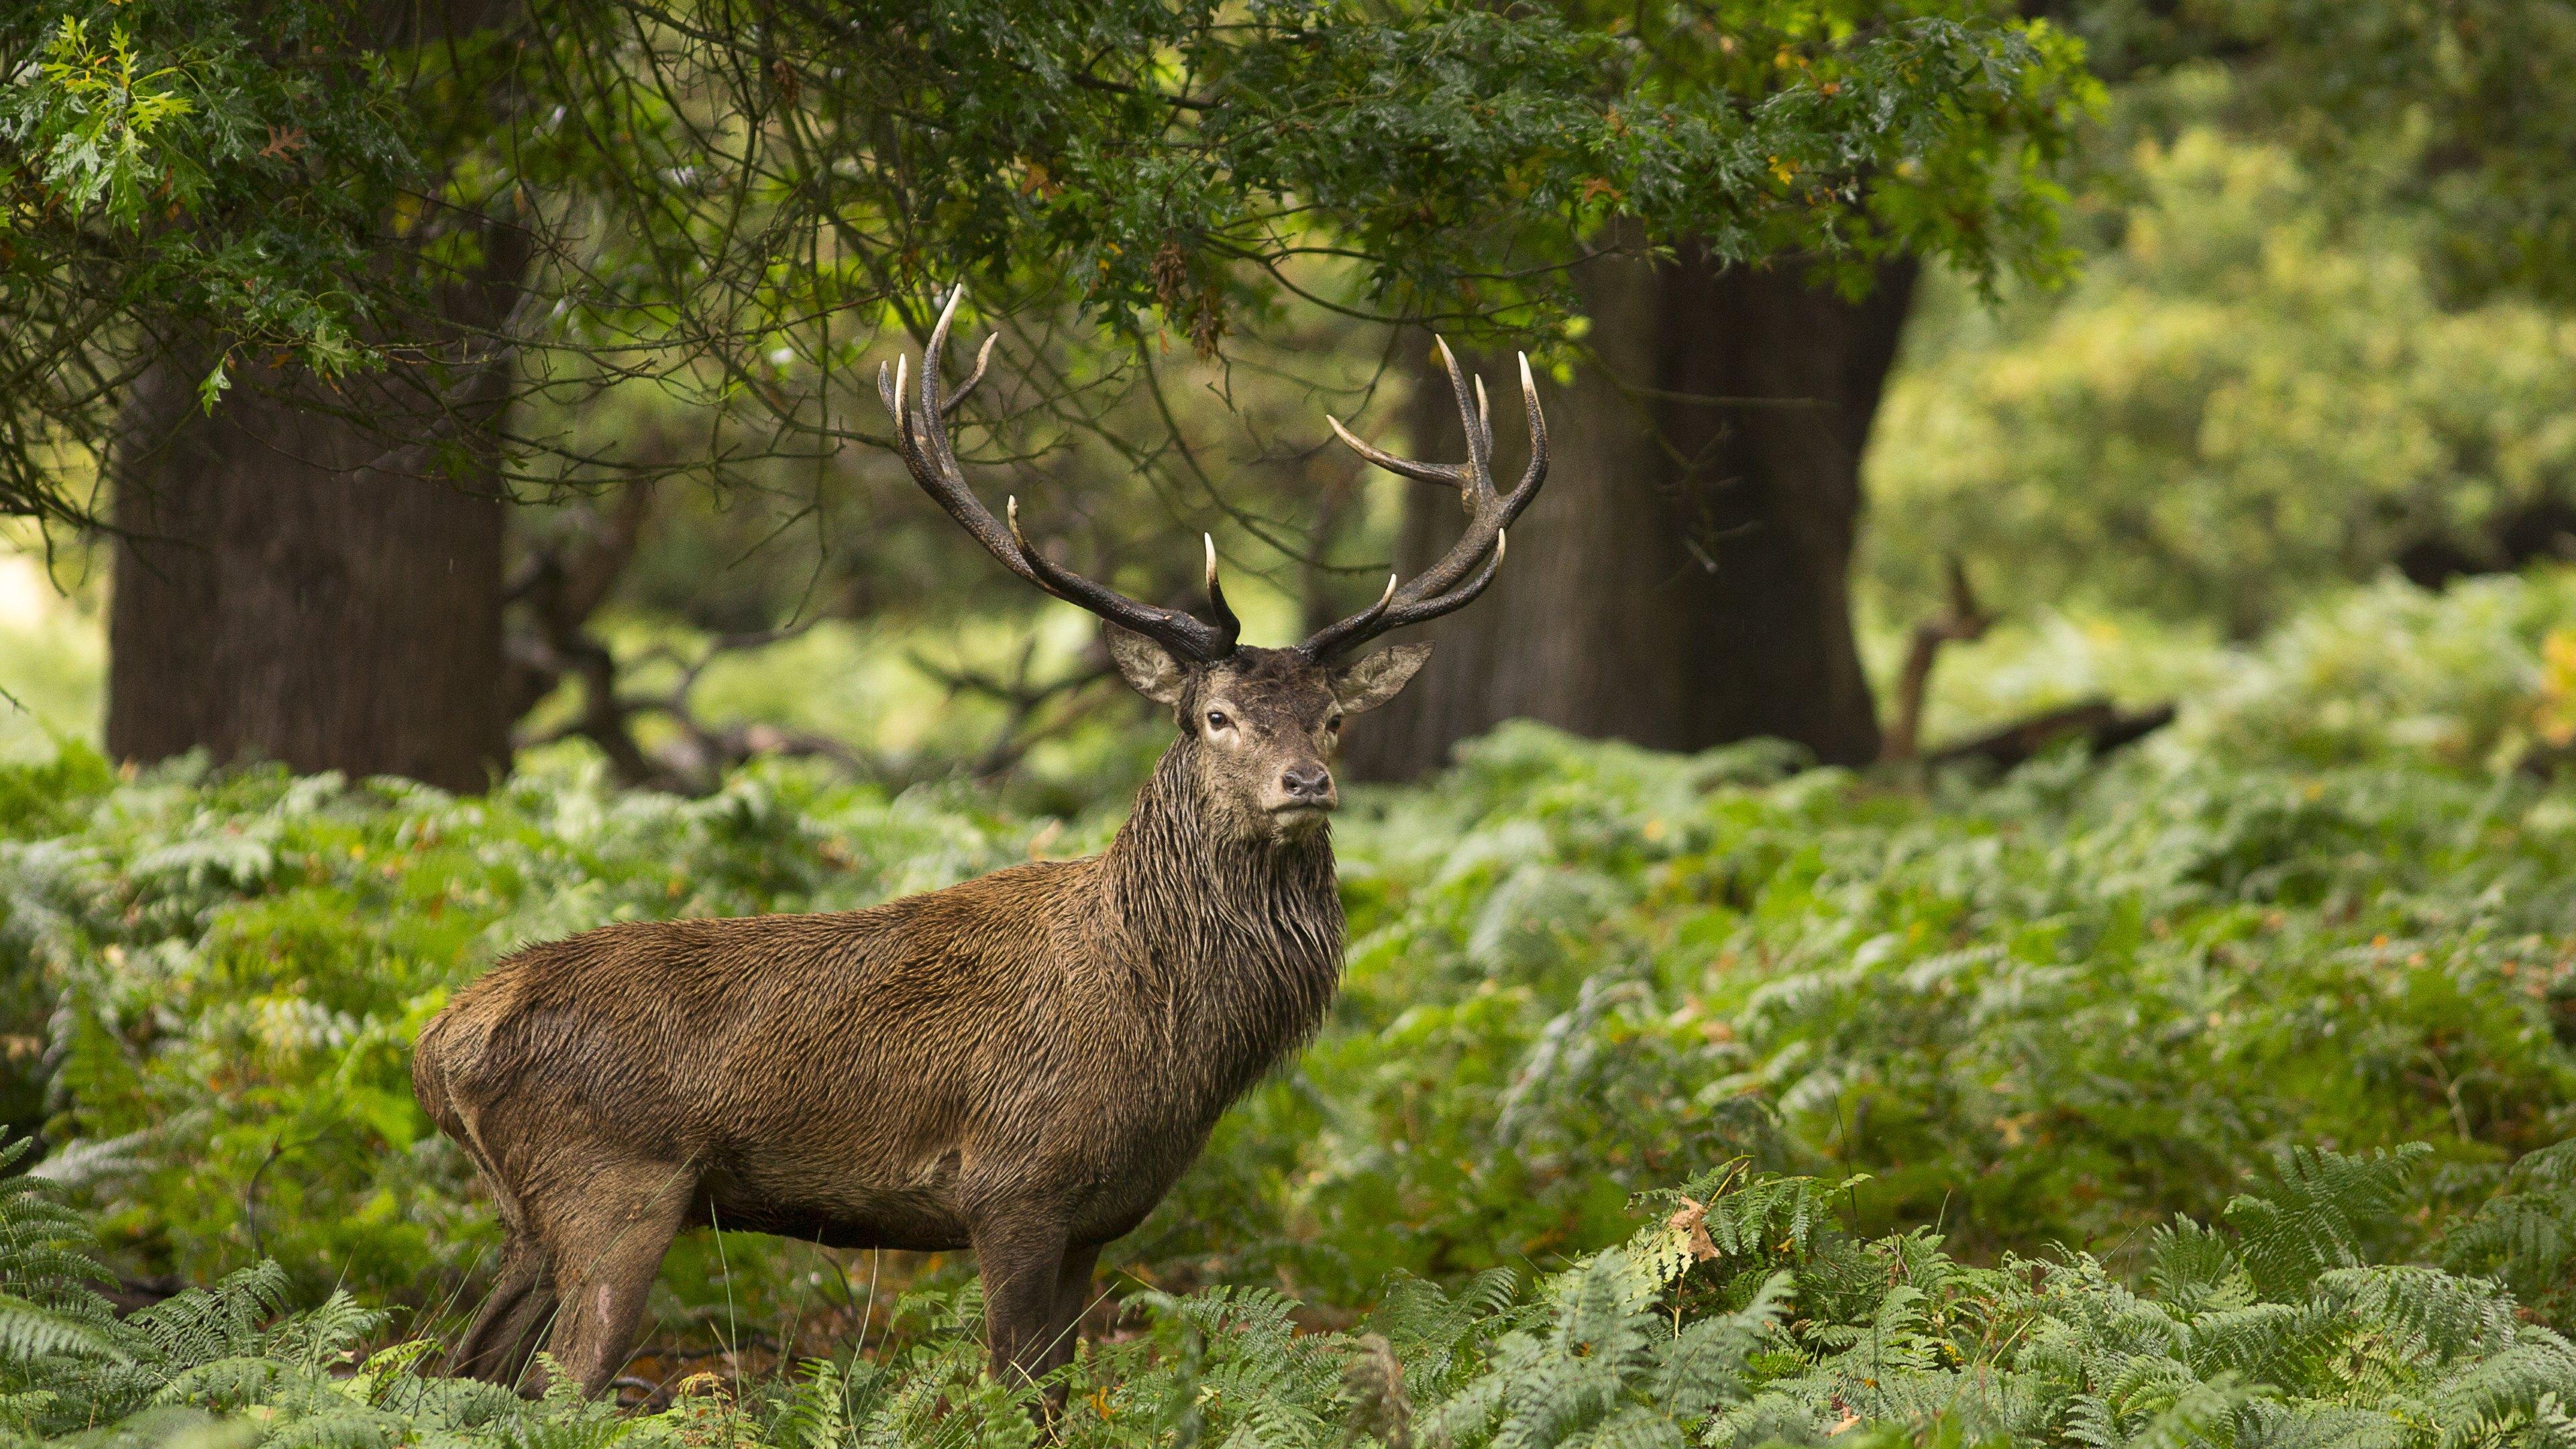 Forest Animal Deer Wallpaper Free Download - Get HD Wallpapers Free